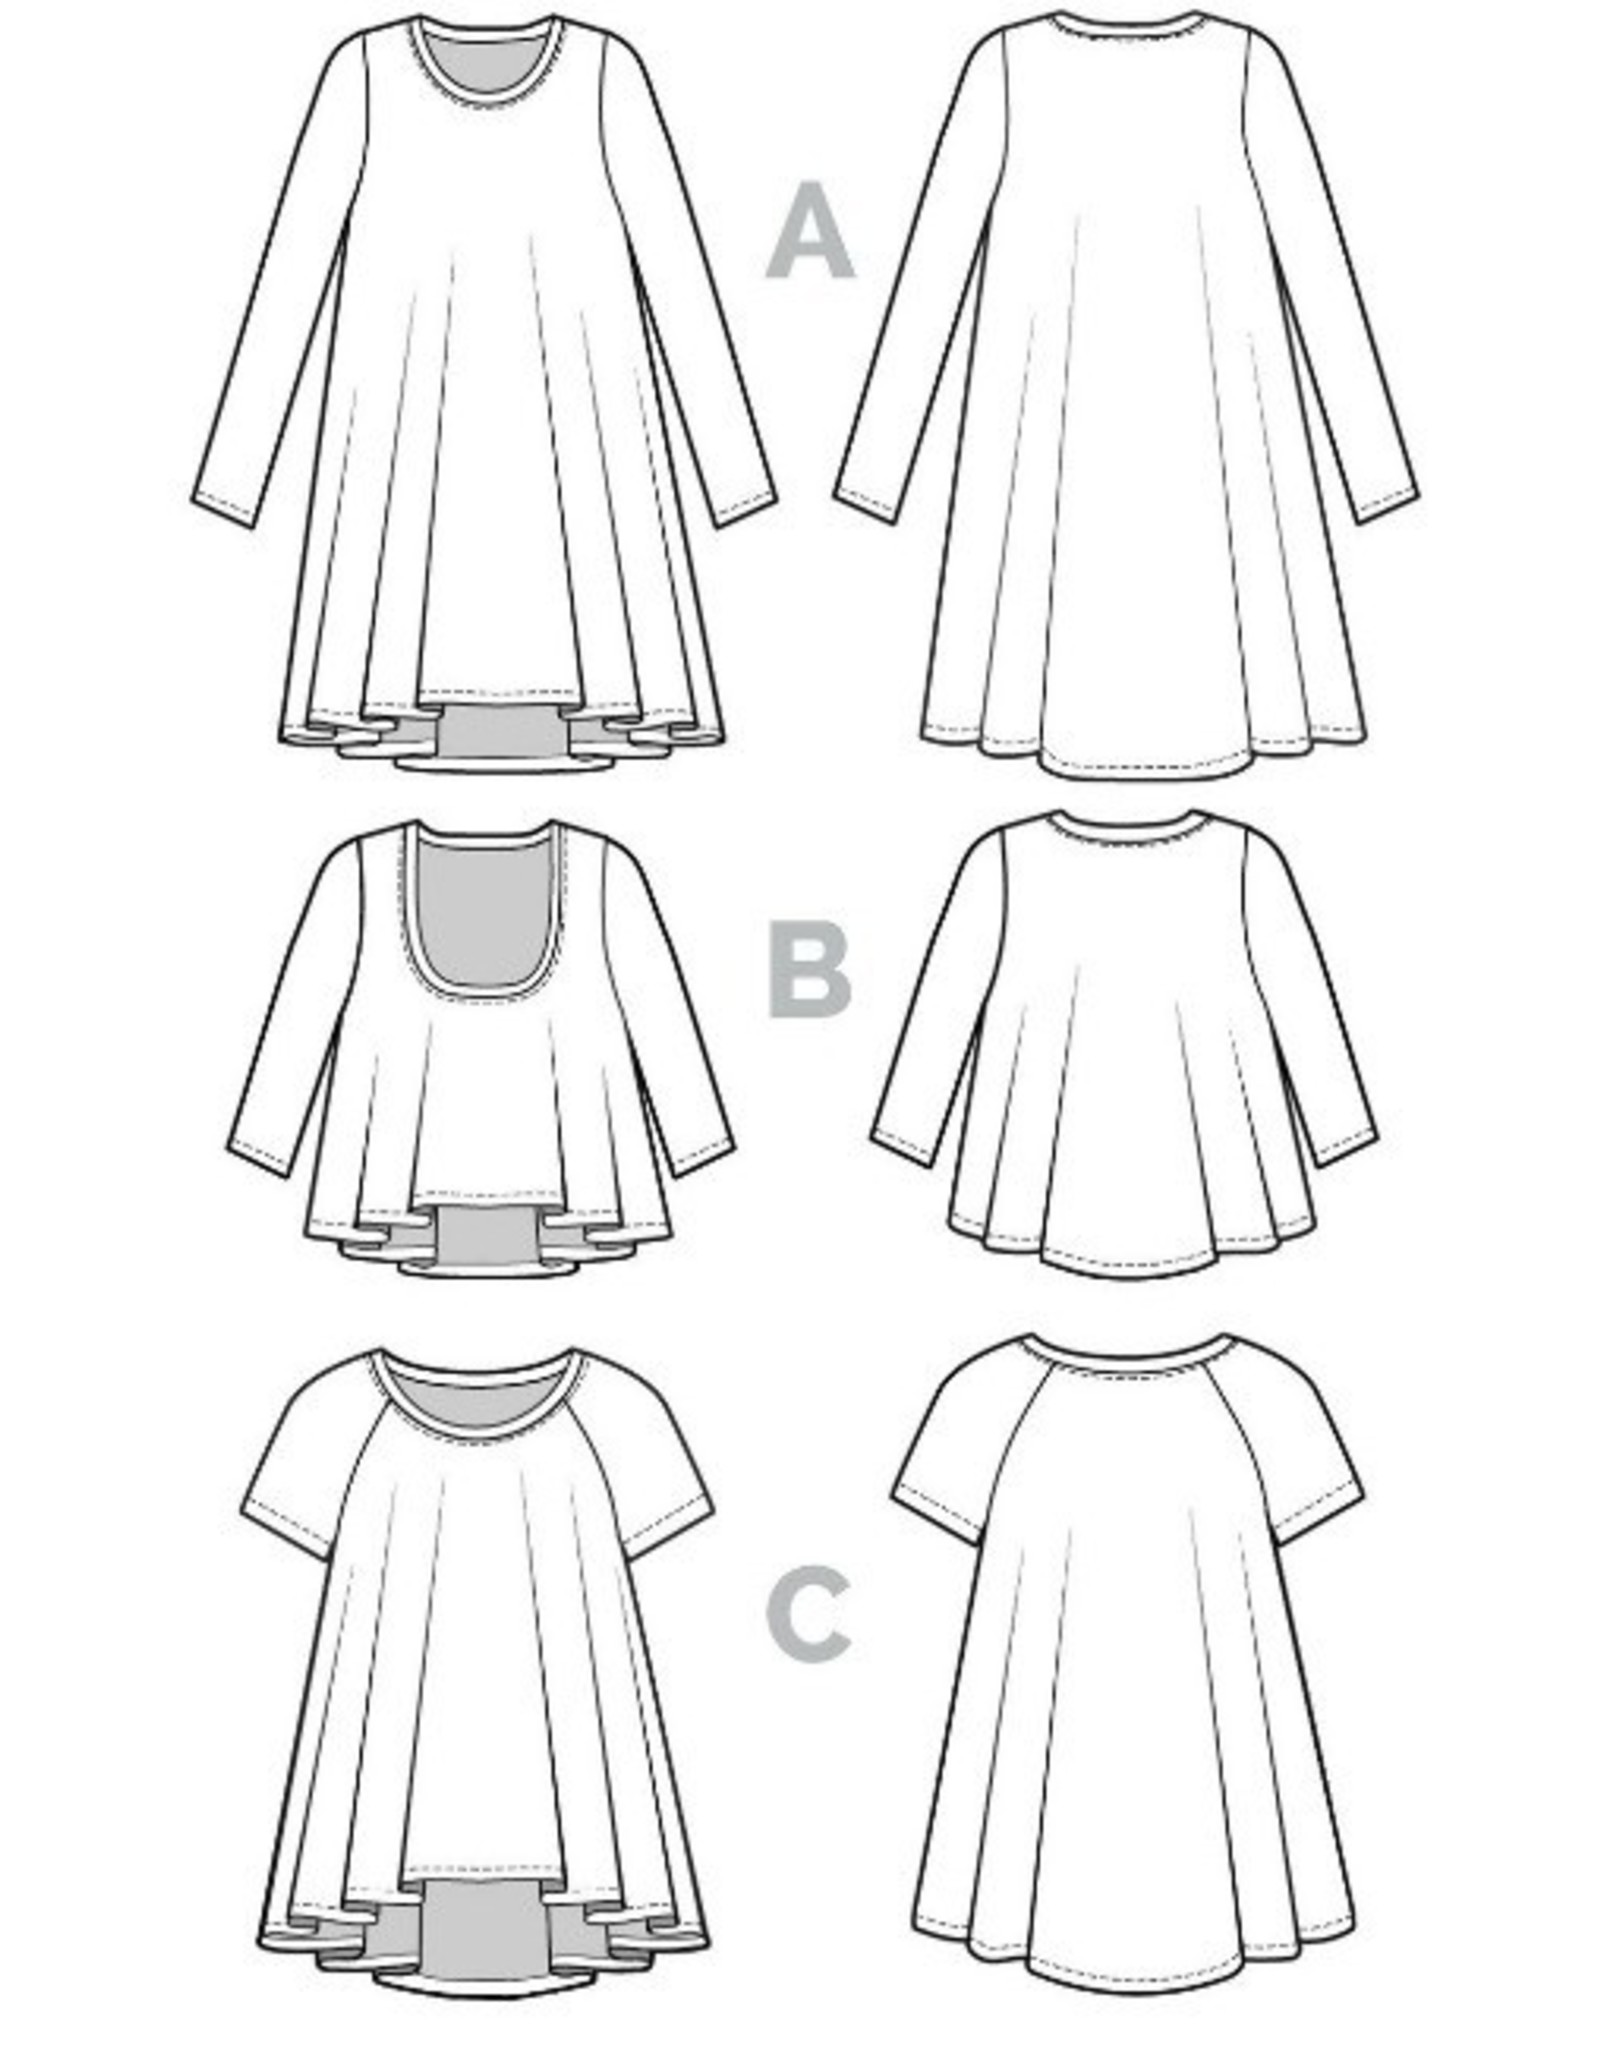 Closet Case Patterns Ebony T-Shirt & Knit Dress Pattern